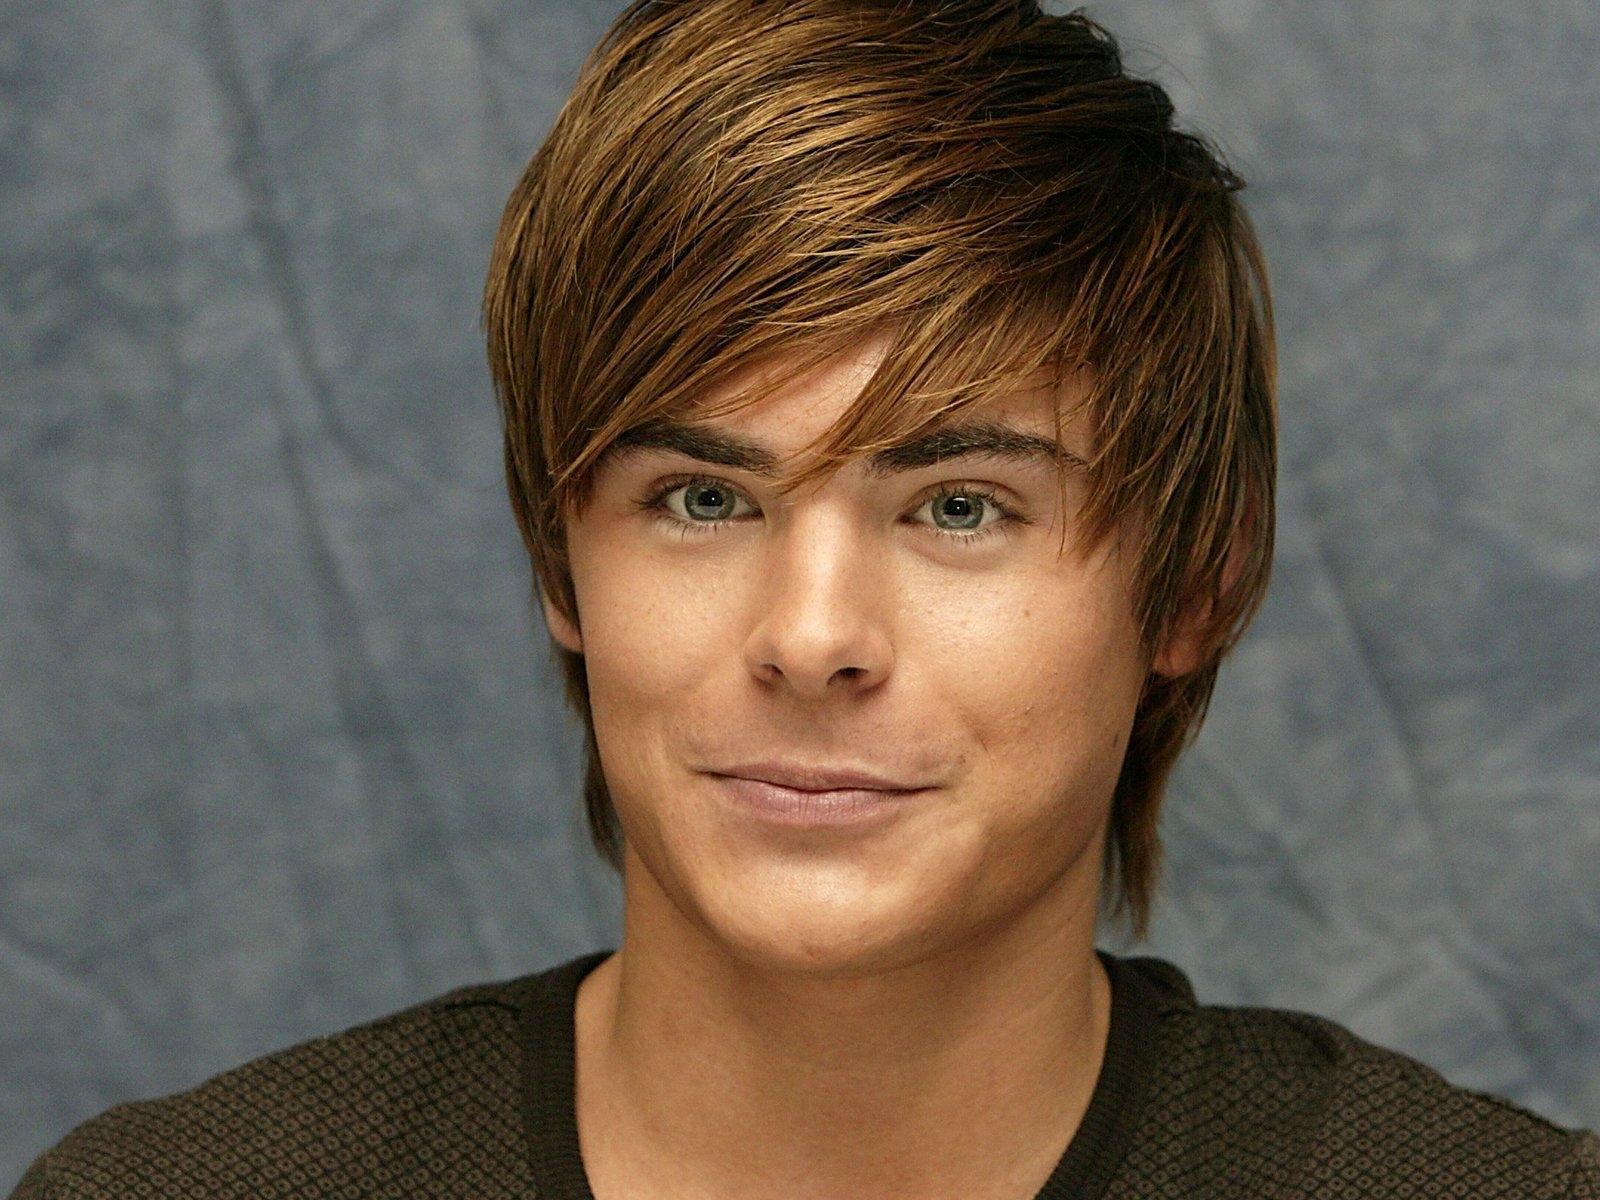 Wallpaper Face Long Hair Bangs Zac Efron Boy Cute Smile